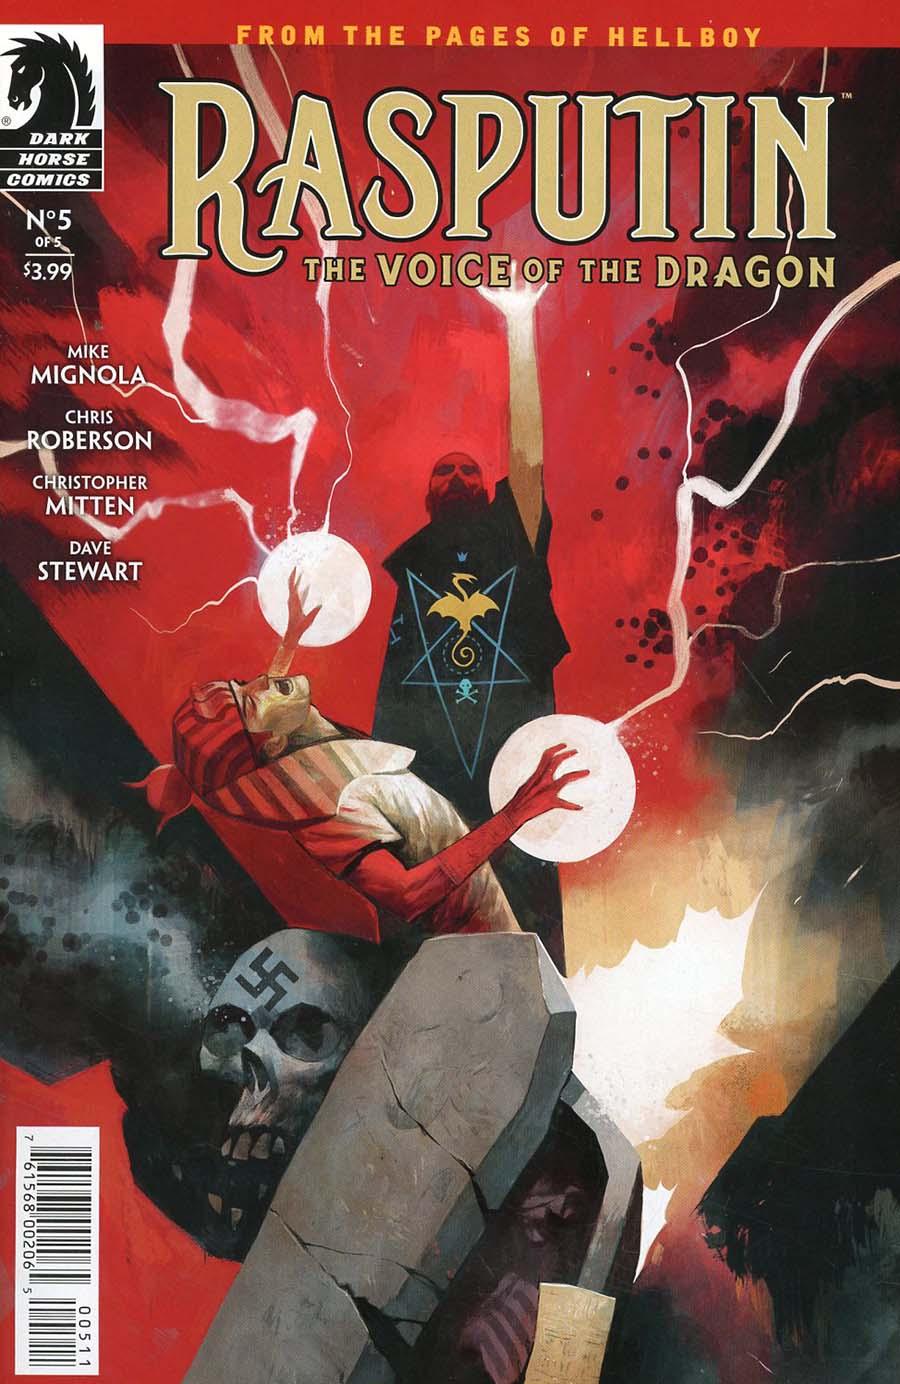 Rasputin Voice Of The Dragon #5 Cover A Regular Mike Huddleston Cover